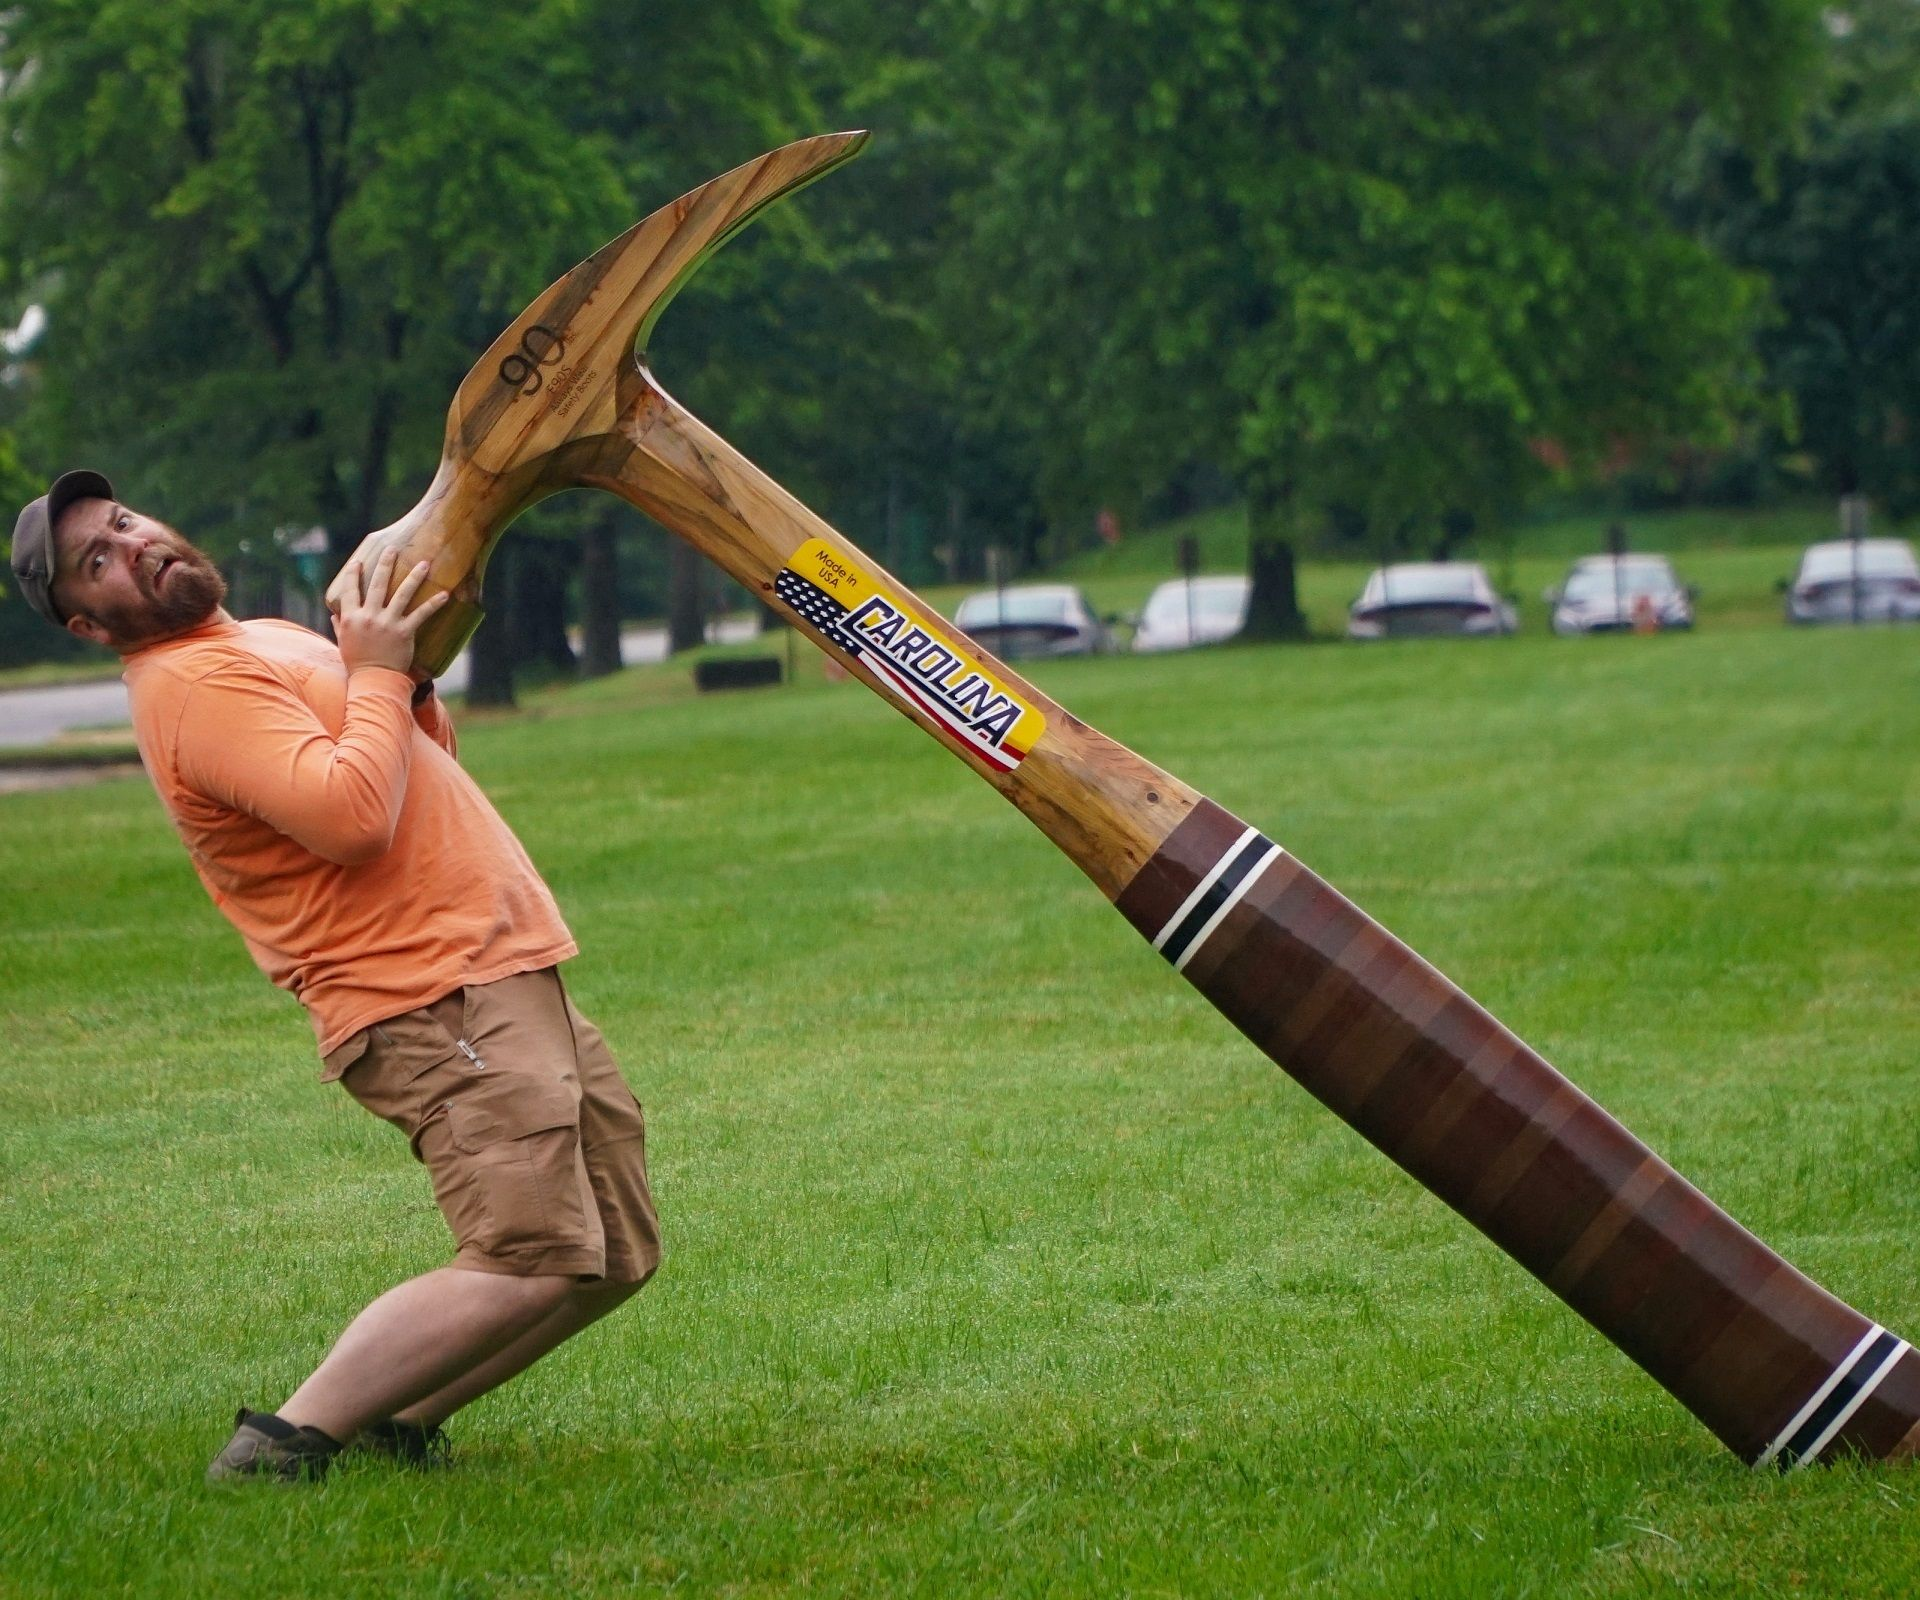 Giant Wood Hammer